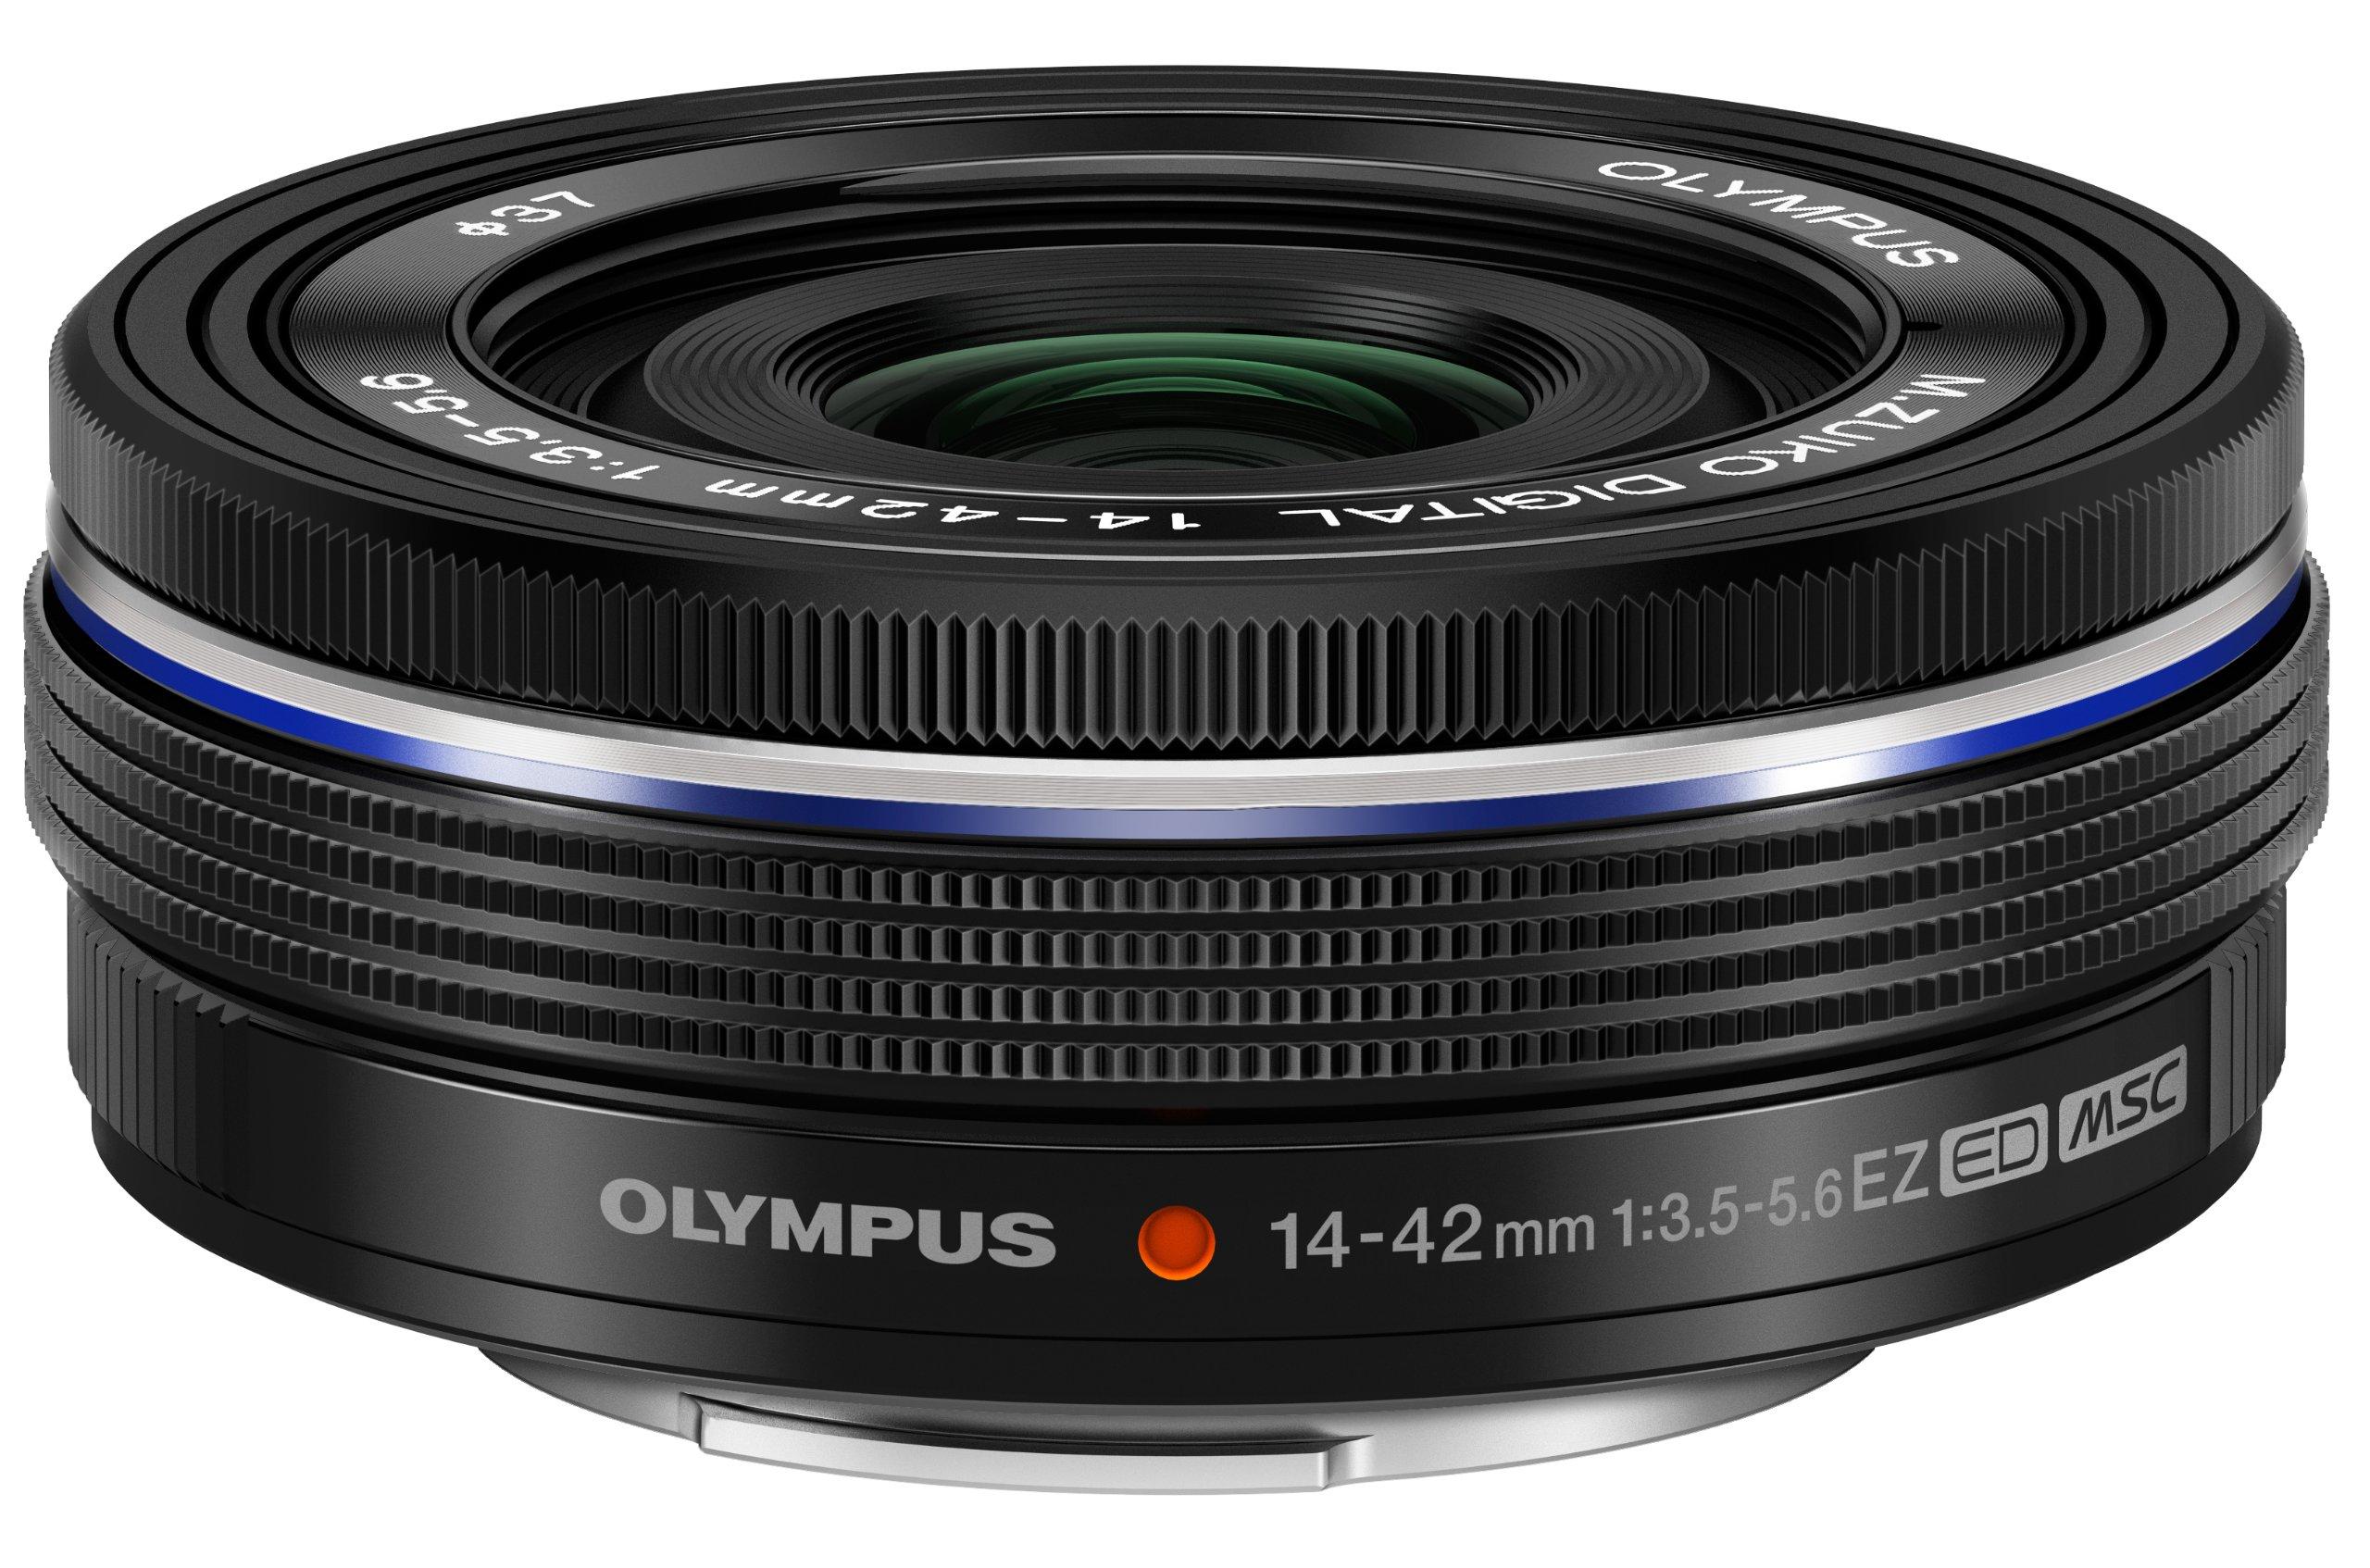 Olympus 14-42mm f3.5-5.6 EZ Interchangeable Lens for Olympus/Panasonic Micro 4/3 Digital Camera (Black) by Olympus